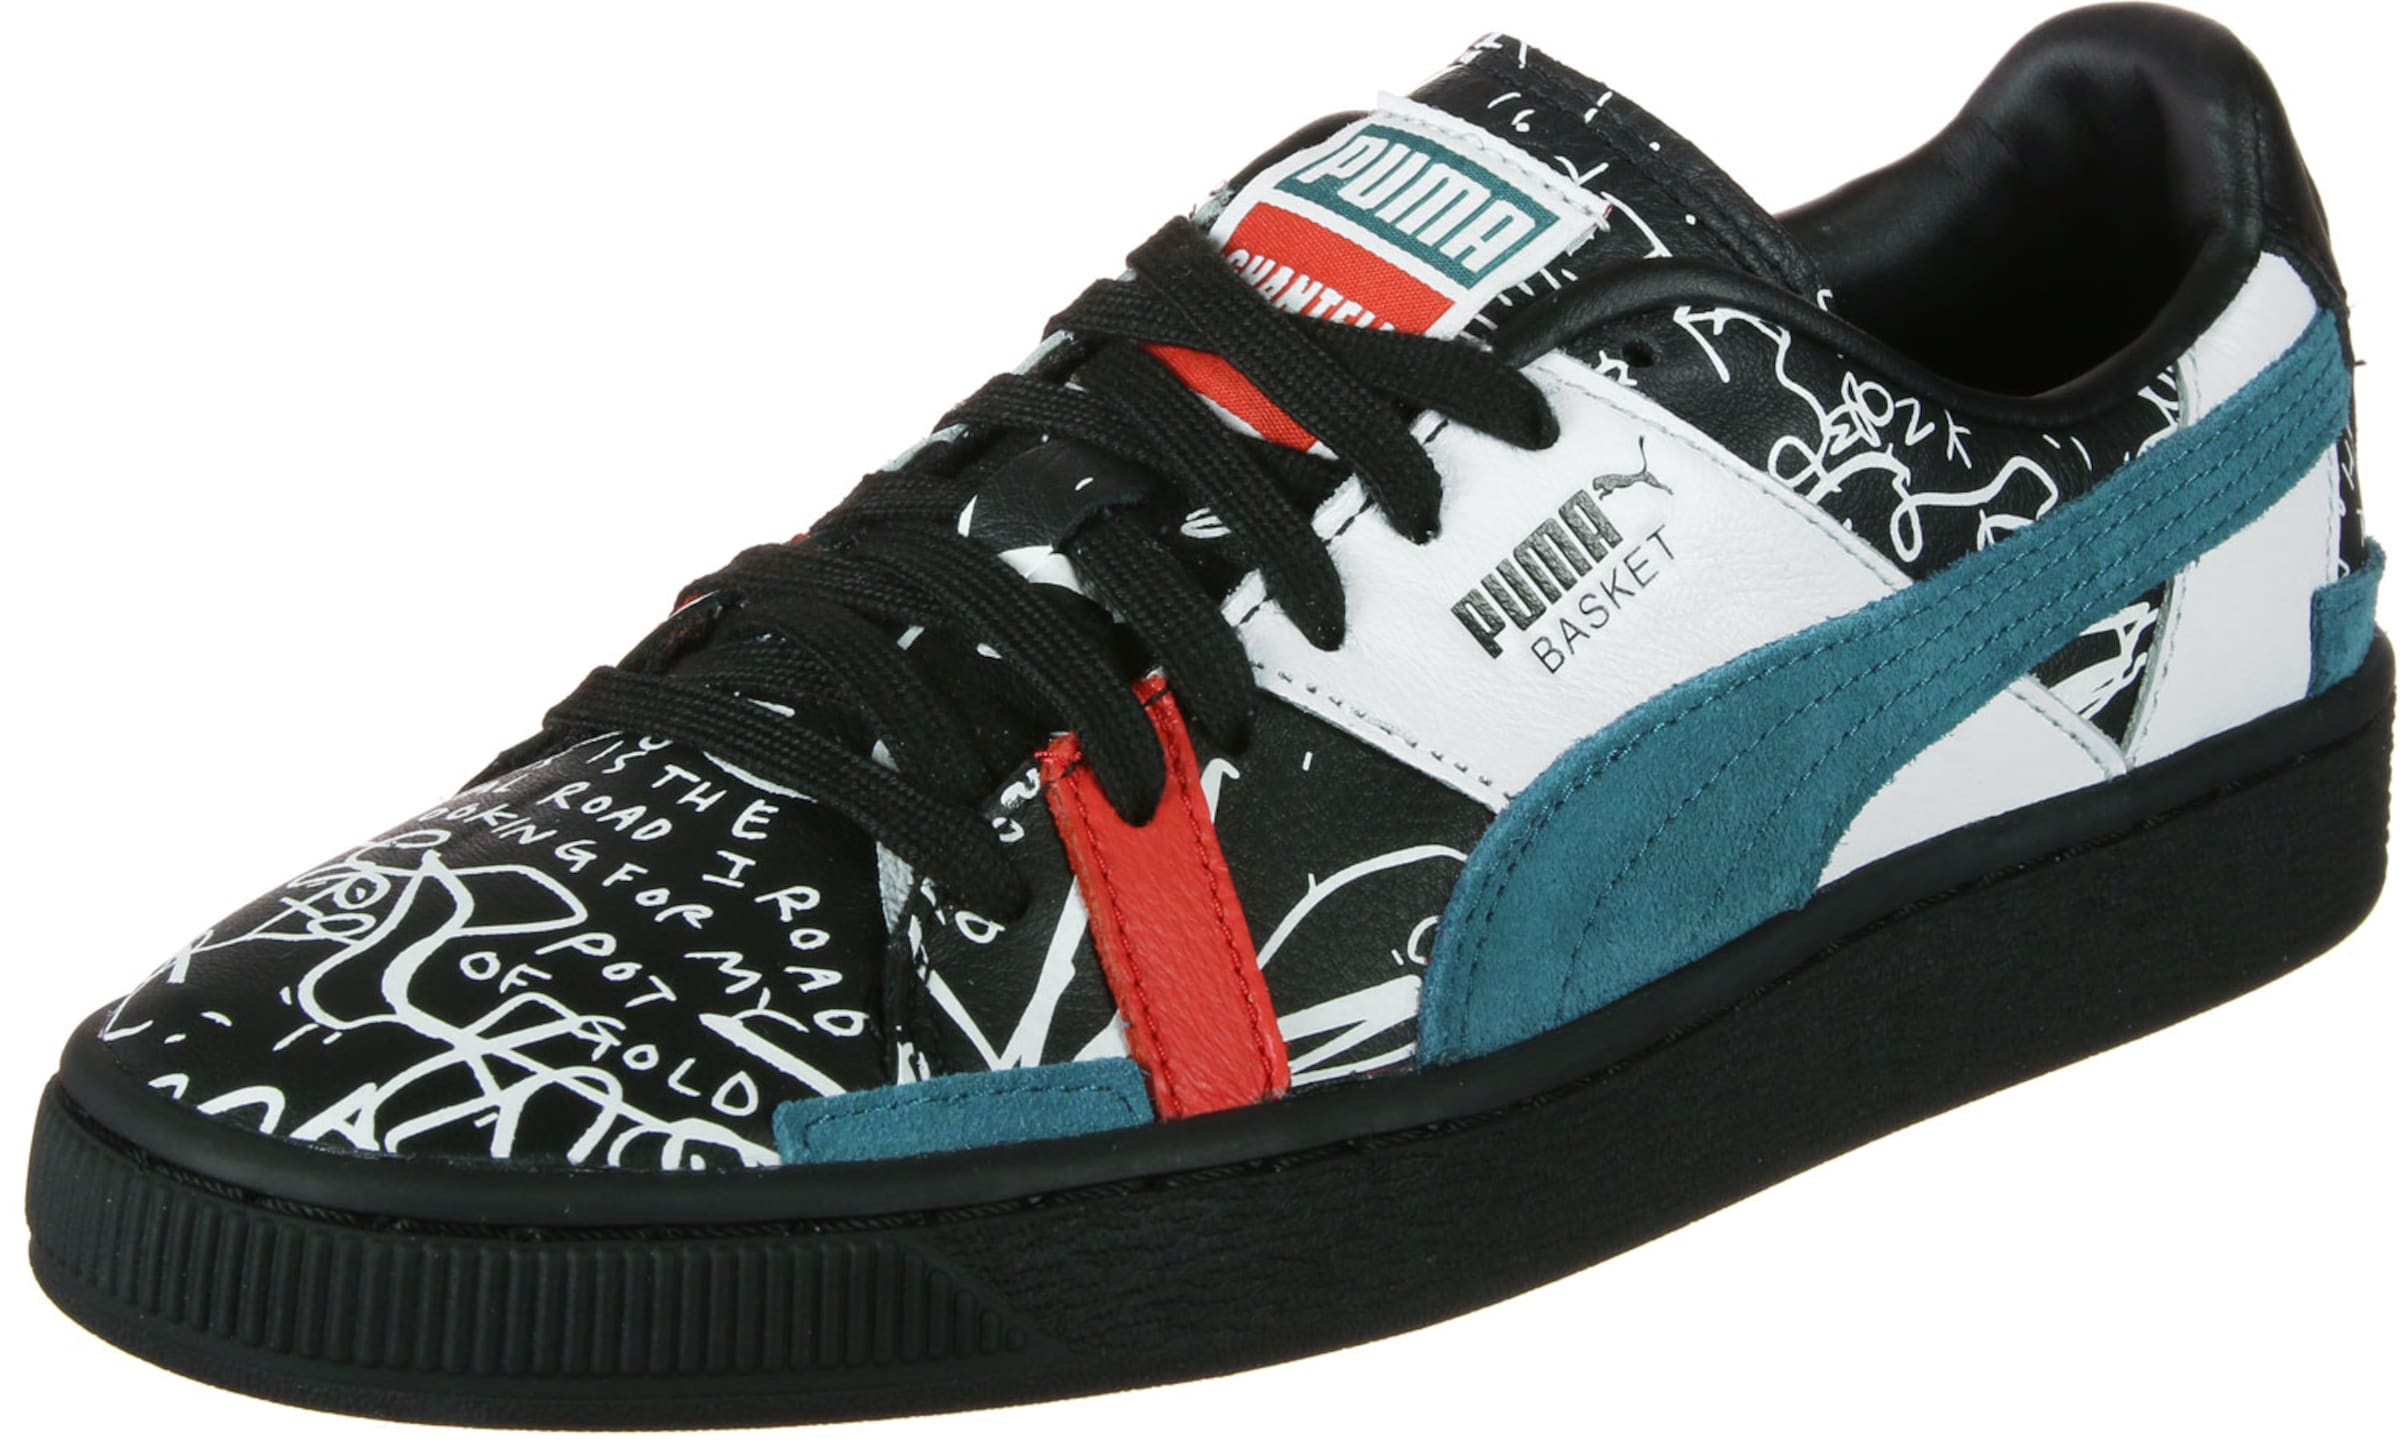 Puma PastellblauRot In Schwarz Sneaker Weiß 9WDHI2E